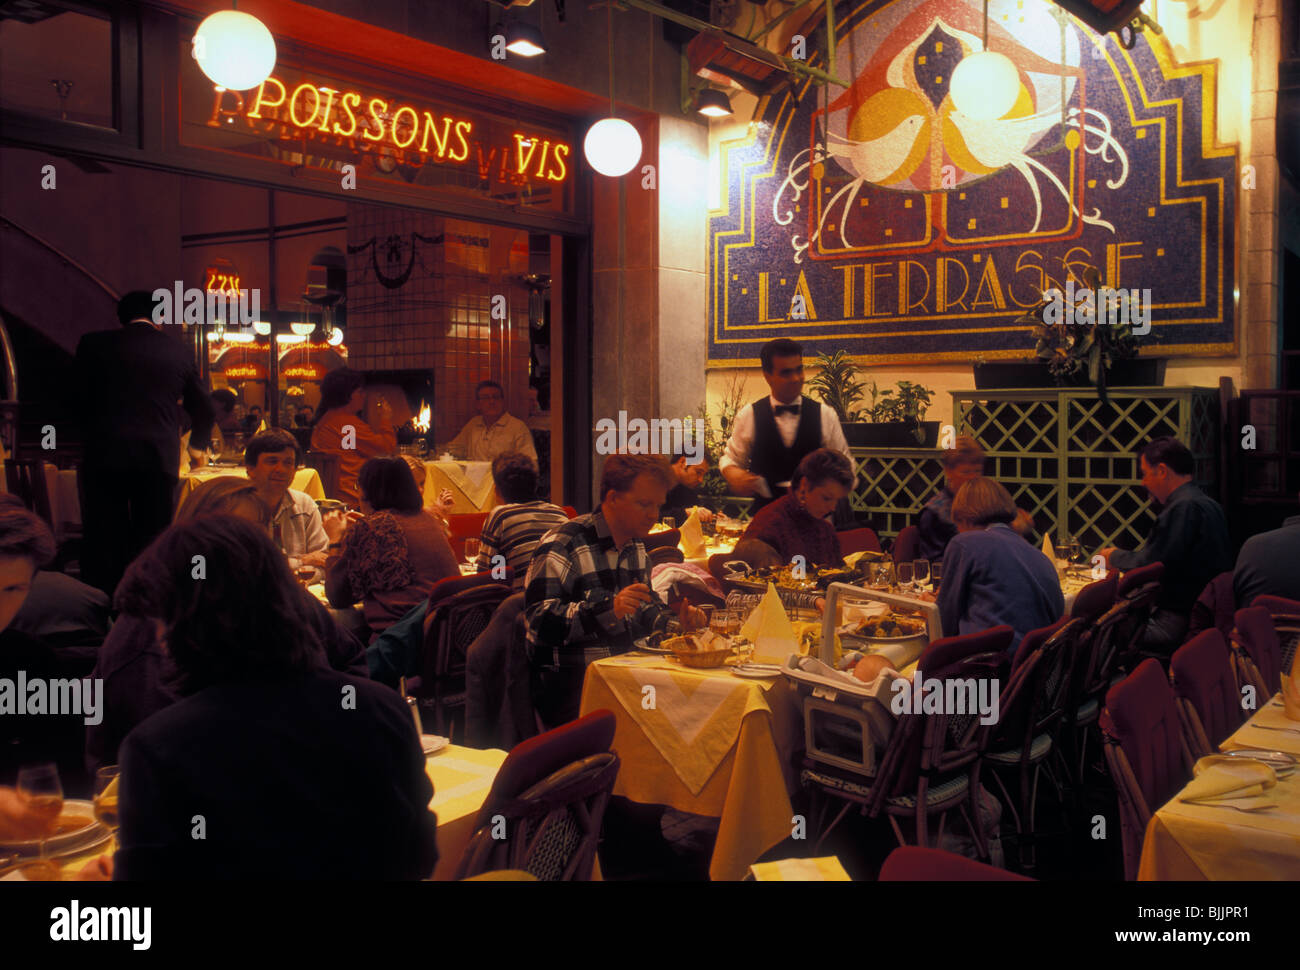 Peuple Belge Les Touristes Salle A Manger Manger Diner